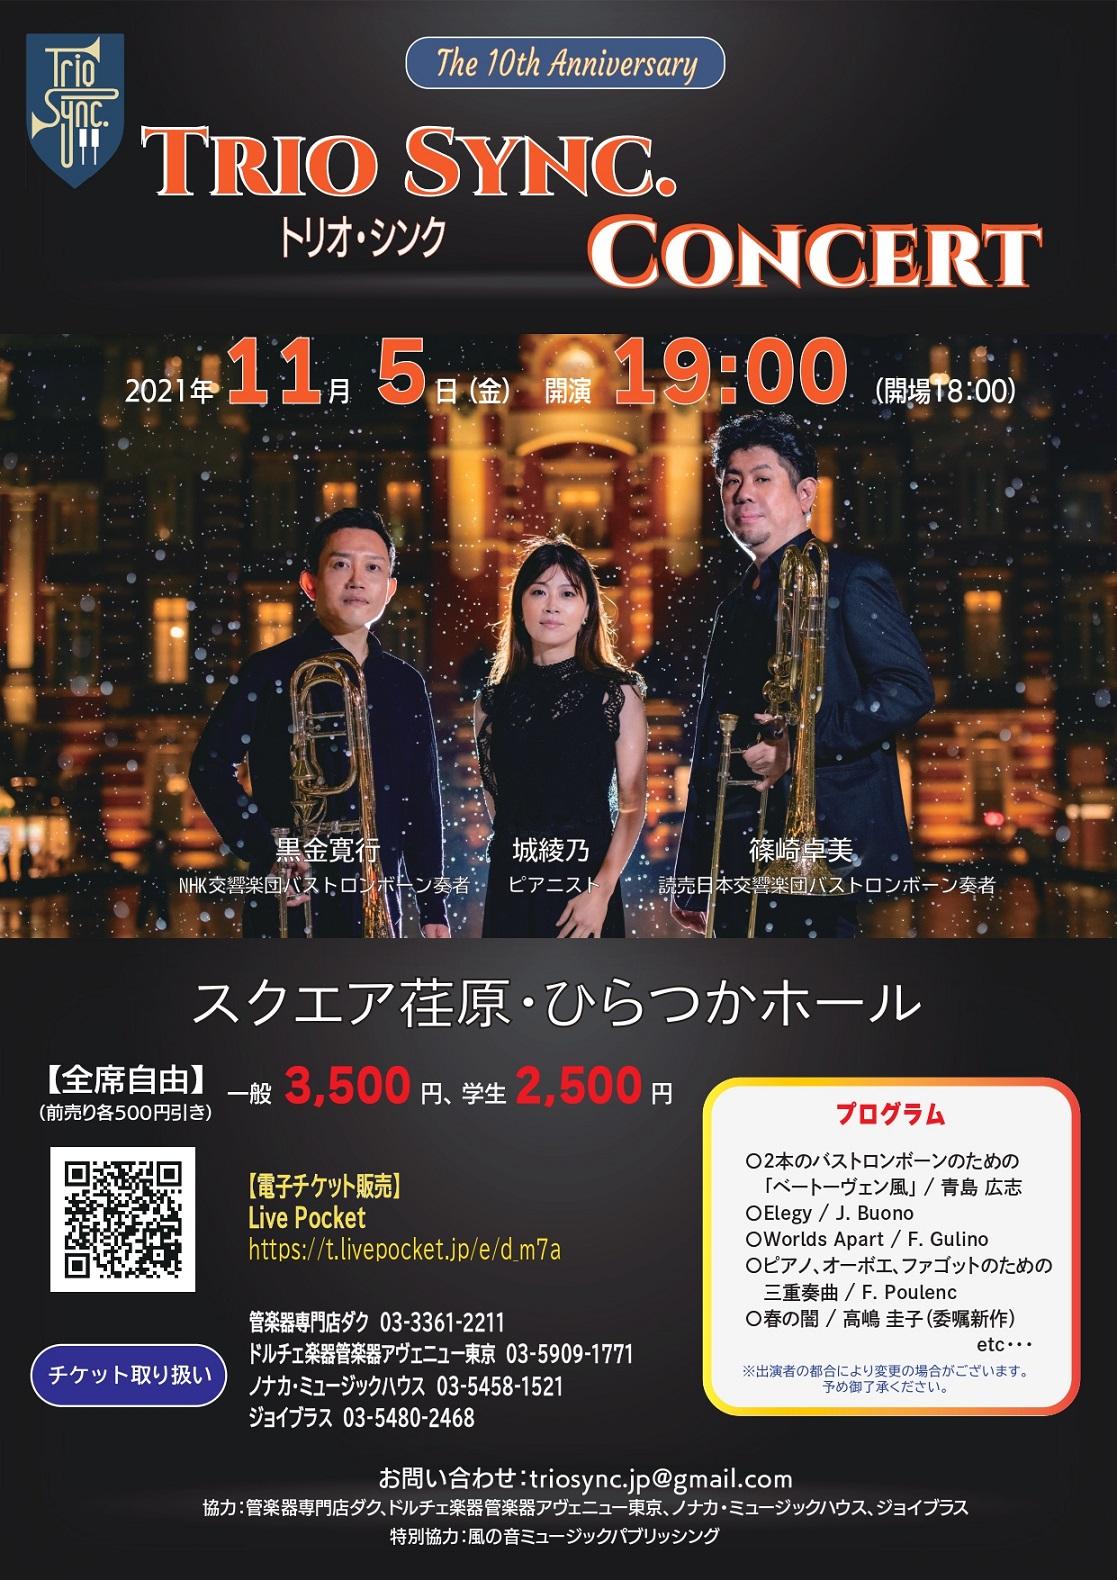 Trio Sync. Concert